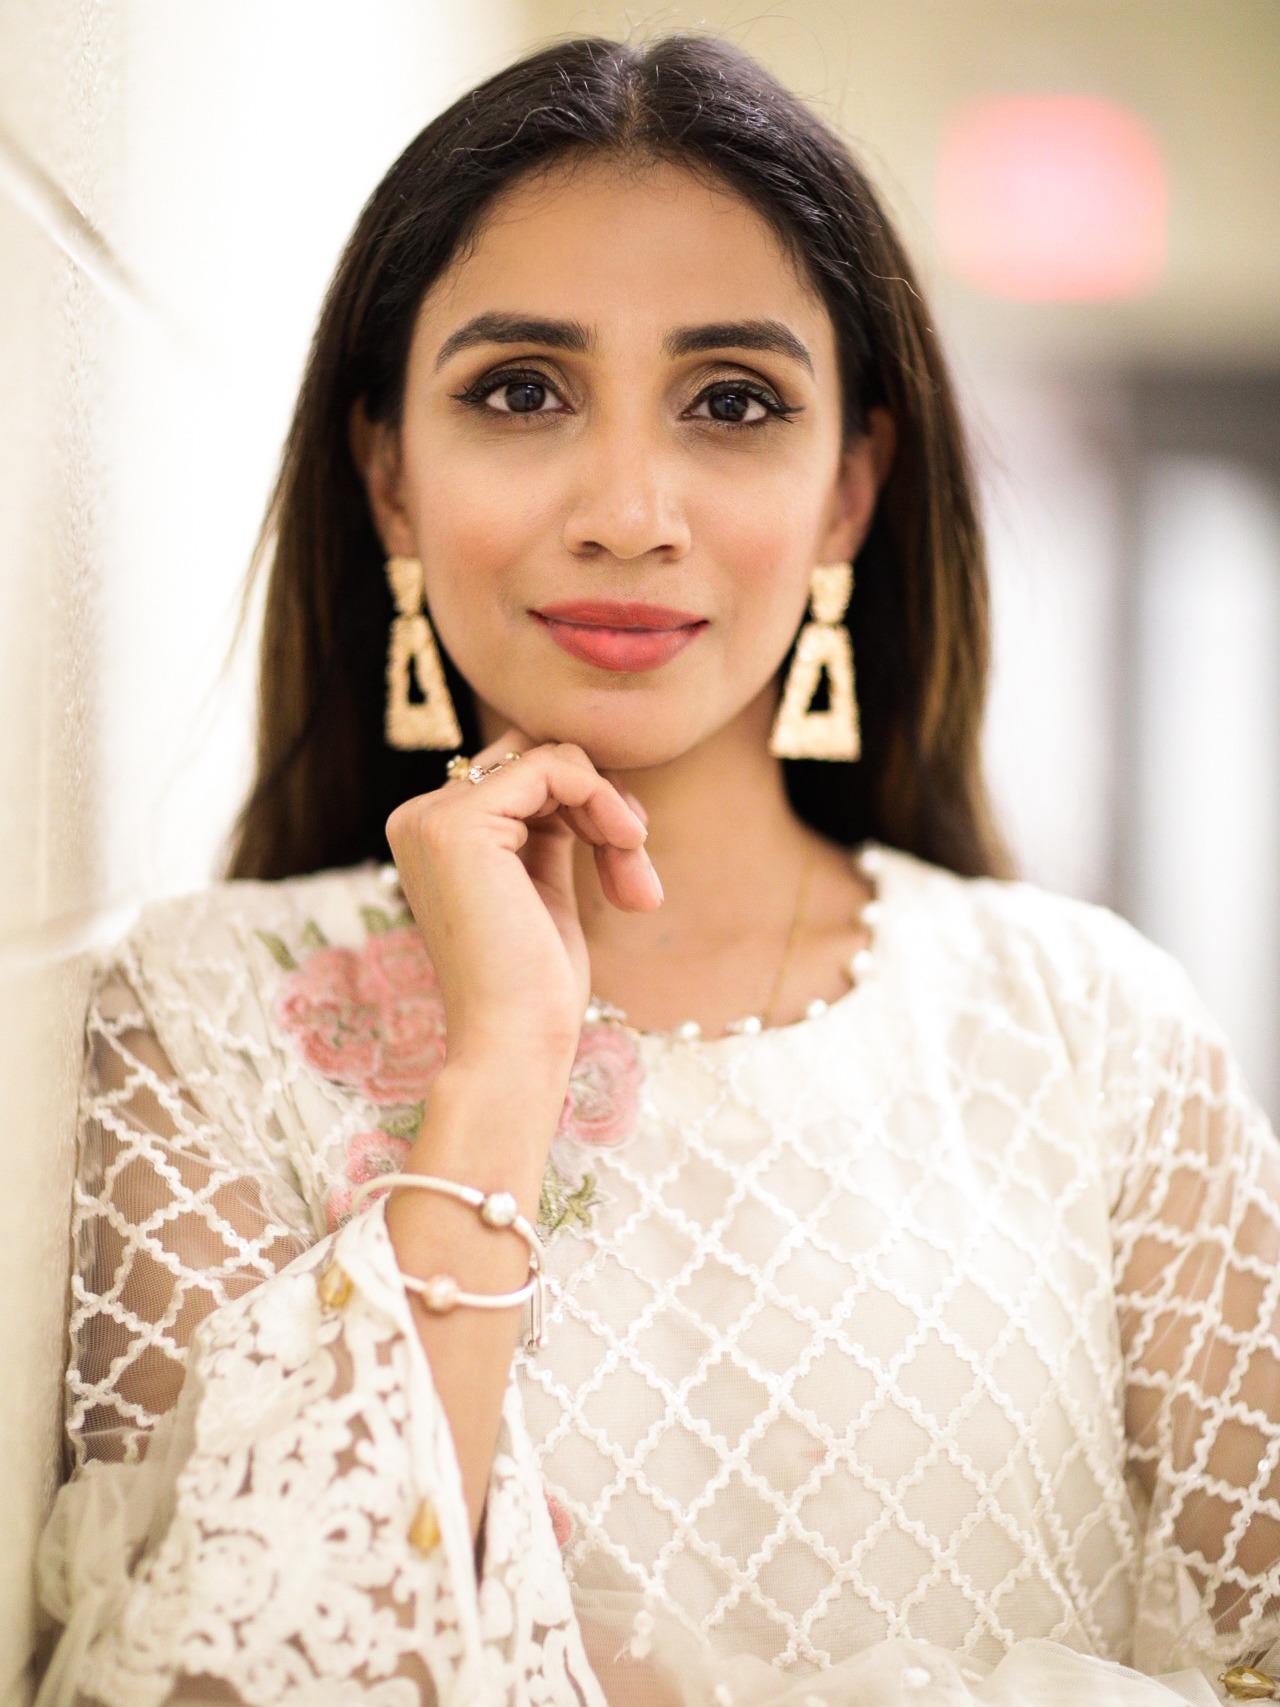 Faiza Inam Sincerely Humble Desi wear pakistani wear south asian wear looks 1